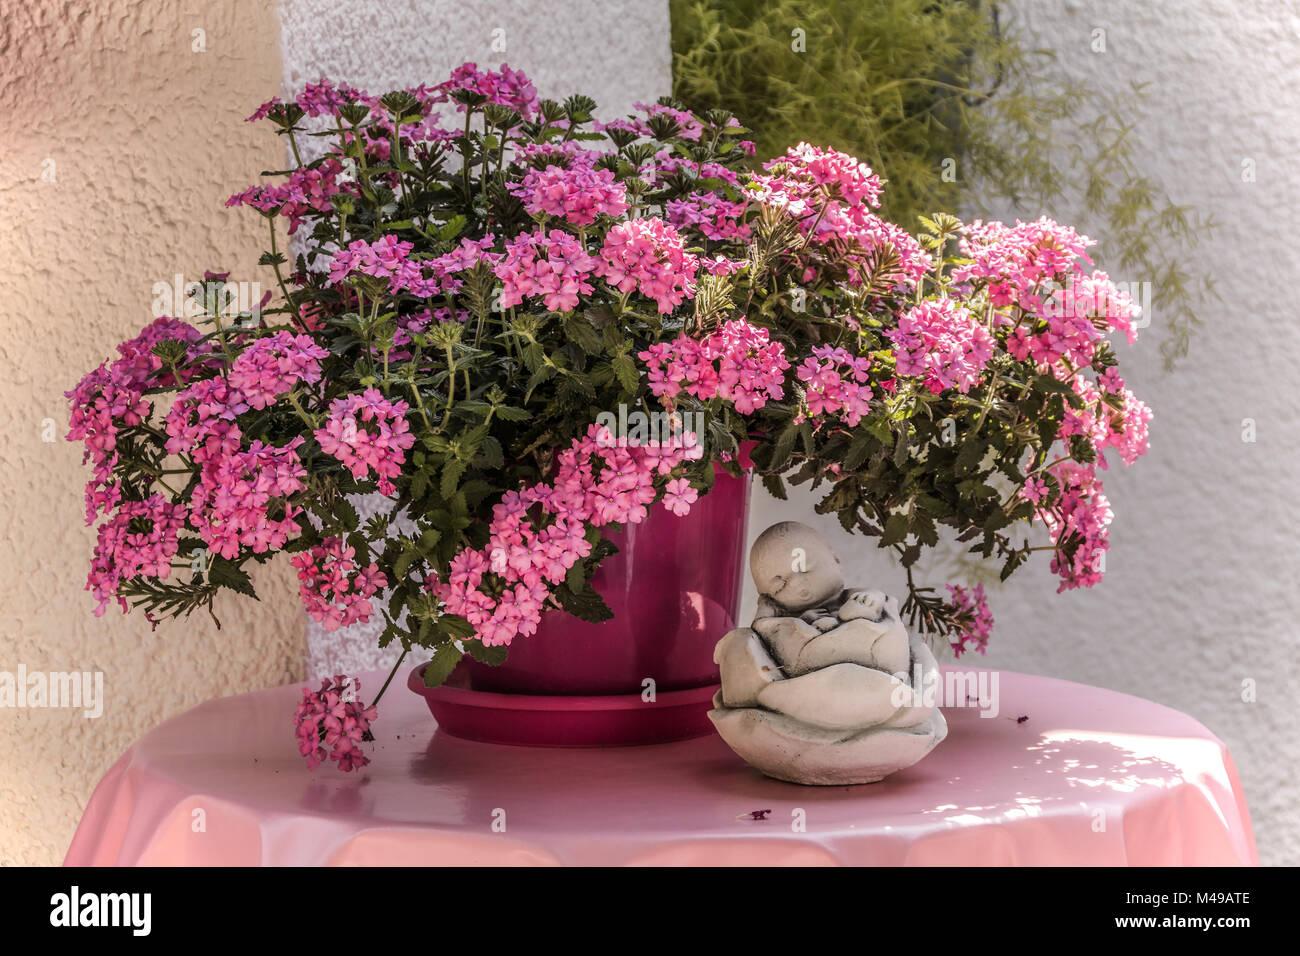 Deko in Pink, geranium with sound figure - Stock Image